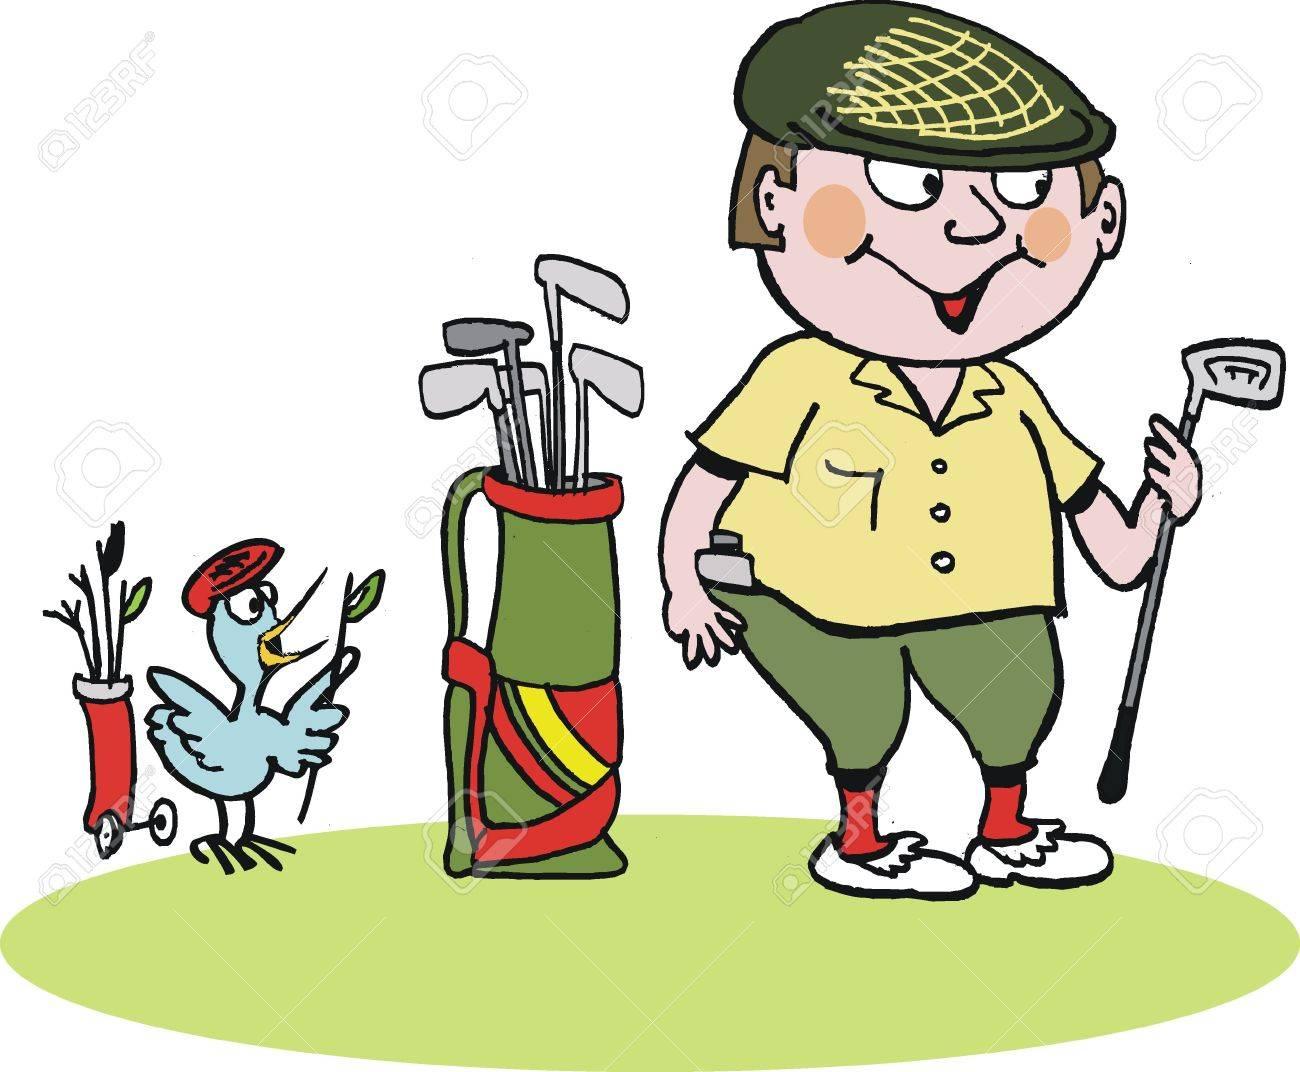 cartoon of Scottish golfer in plus fours Stock Vector - 12233381